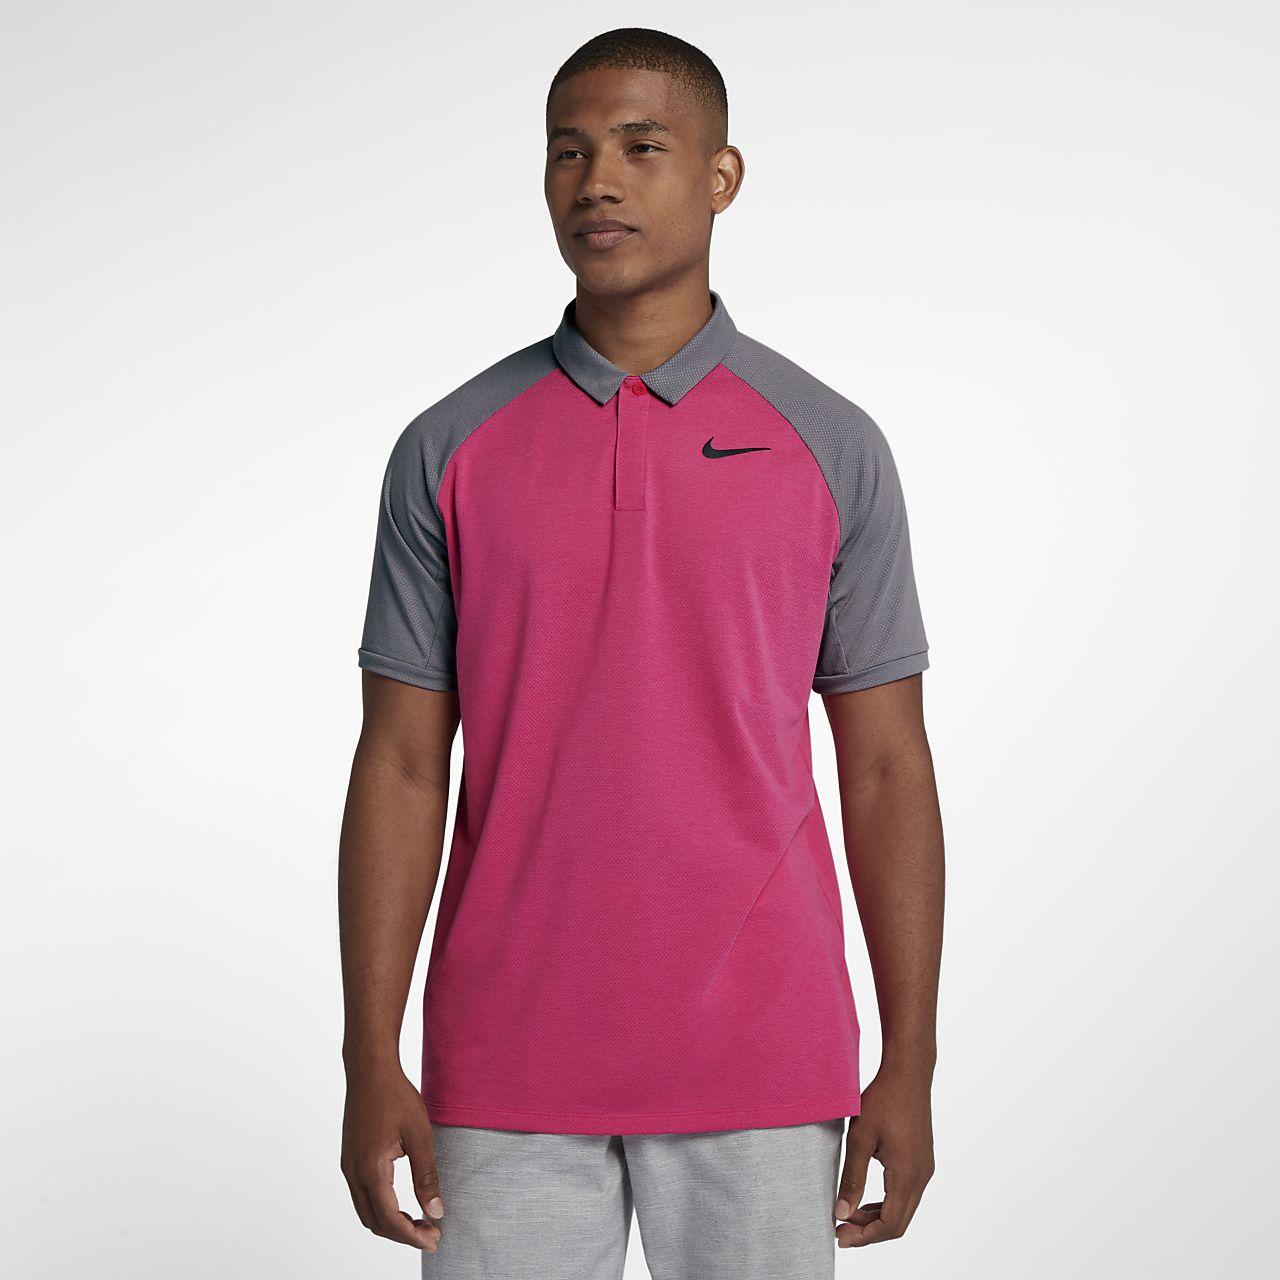 Polo de golf con ajuste estándar para hombre Nike Dri-FIT